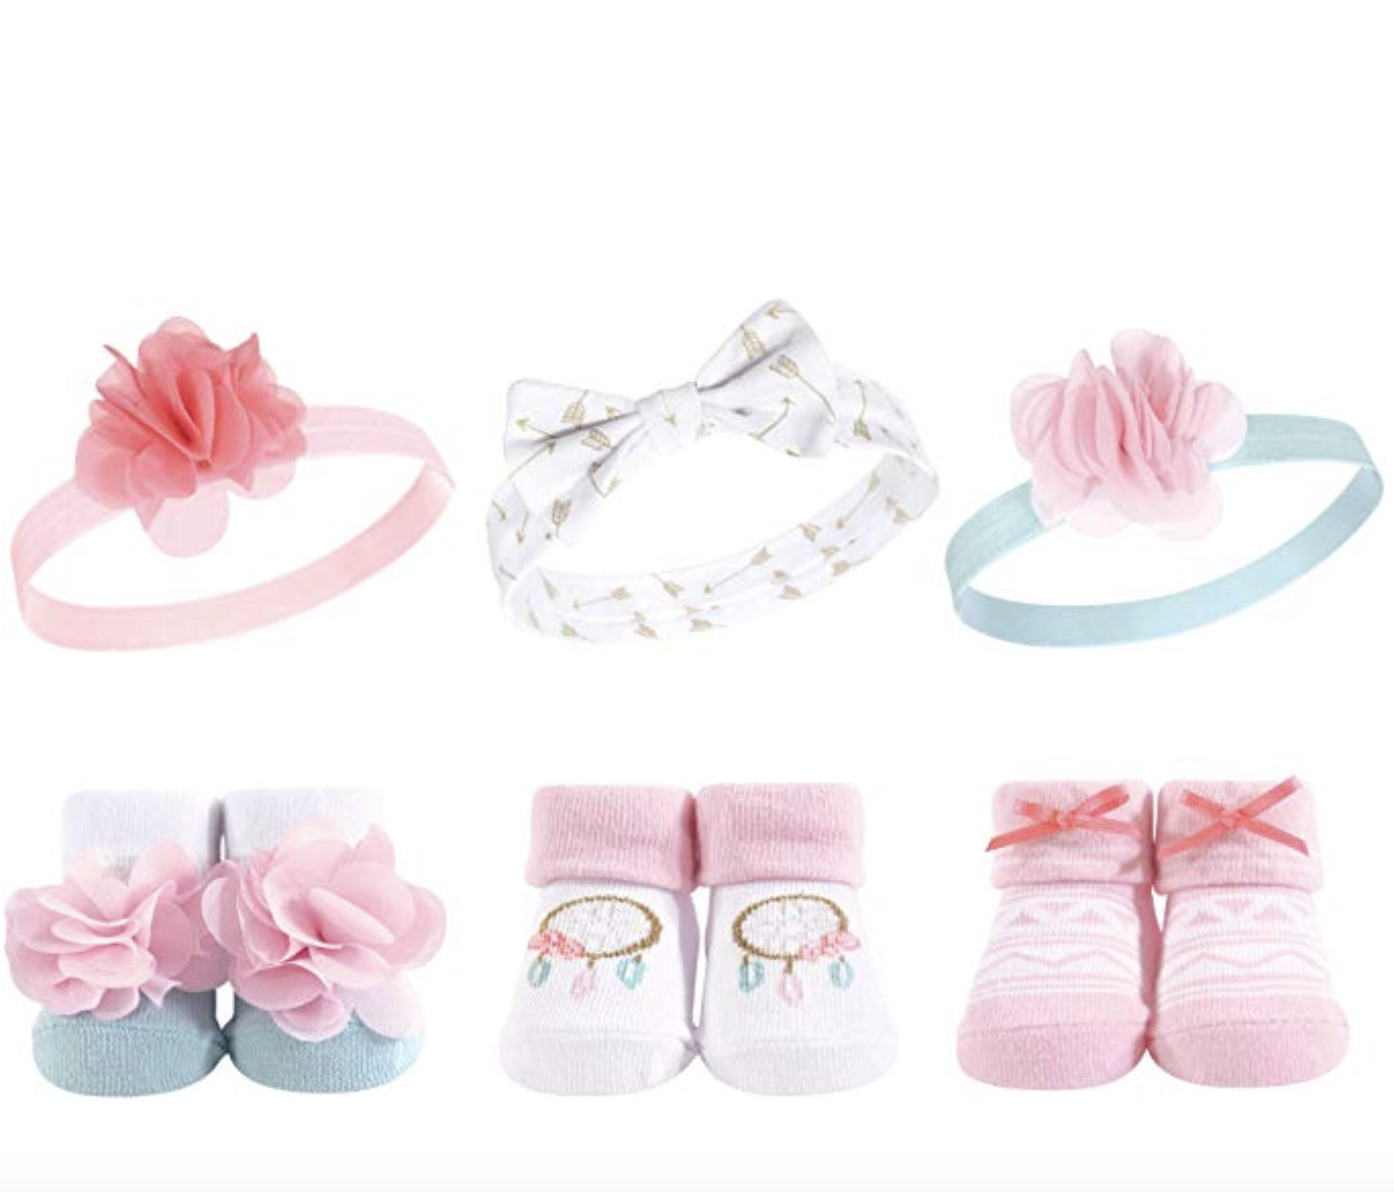 NEW BABY 3pc GIFT SET shoes ears headband 1st birthday mini top